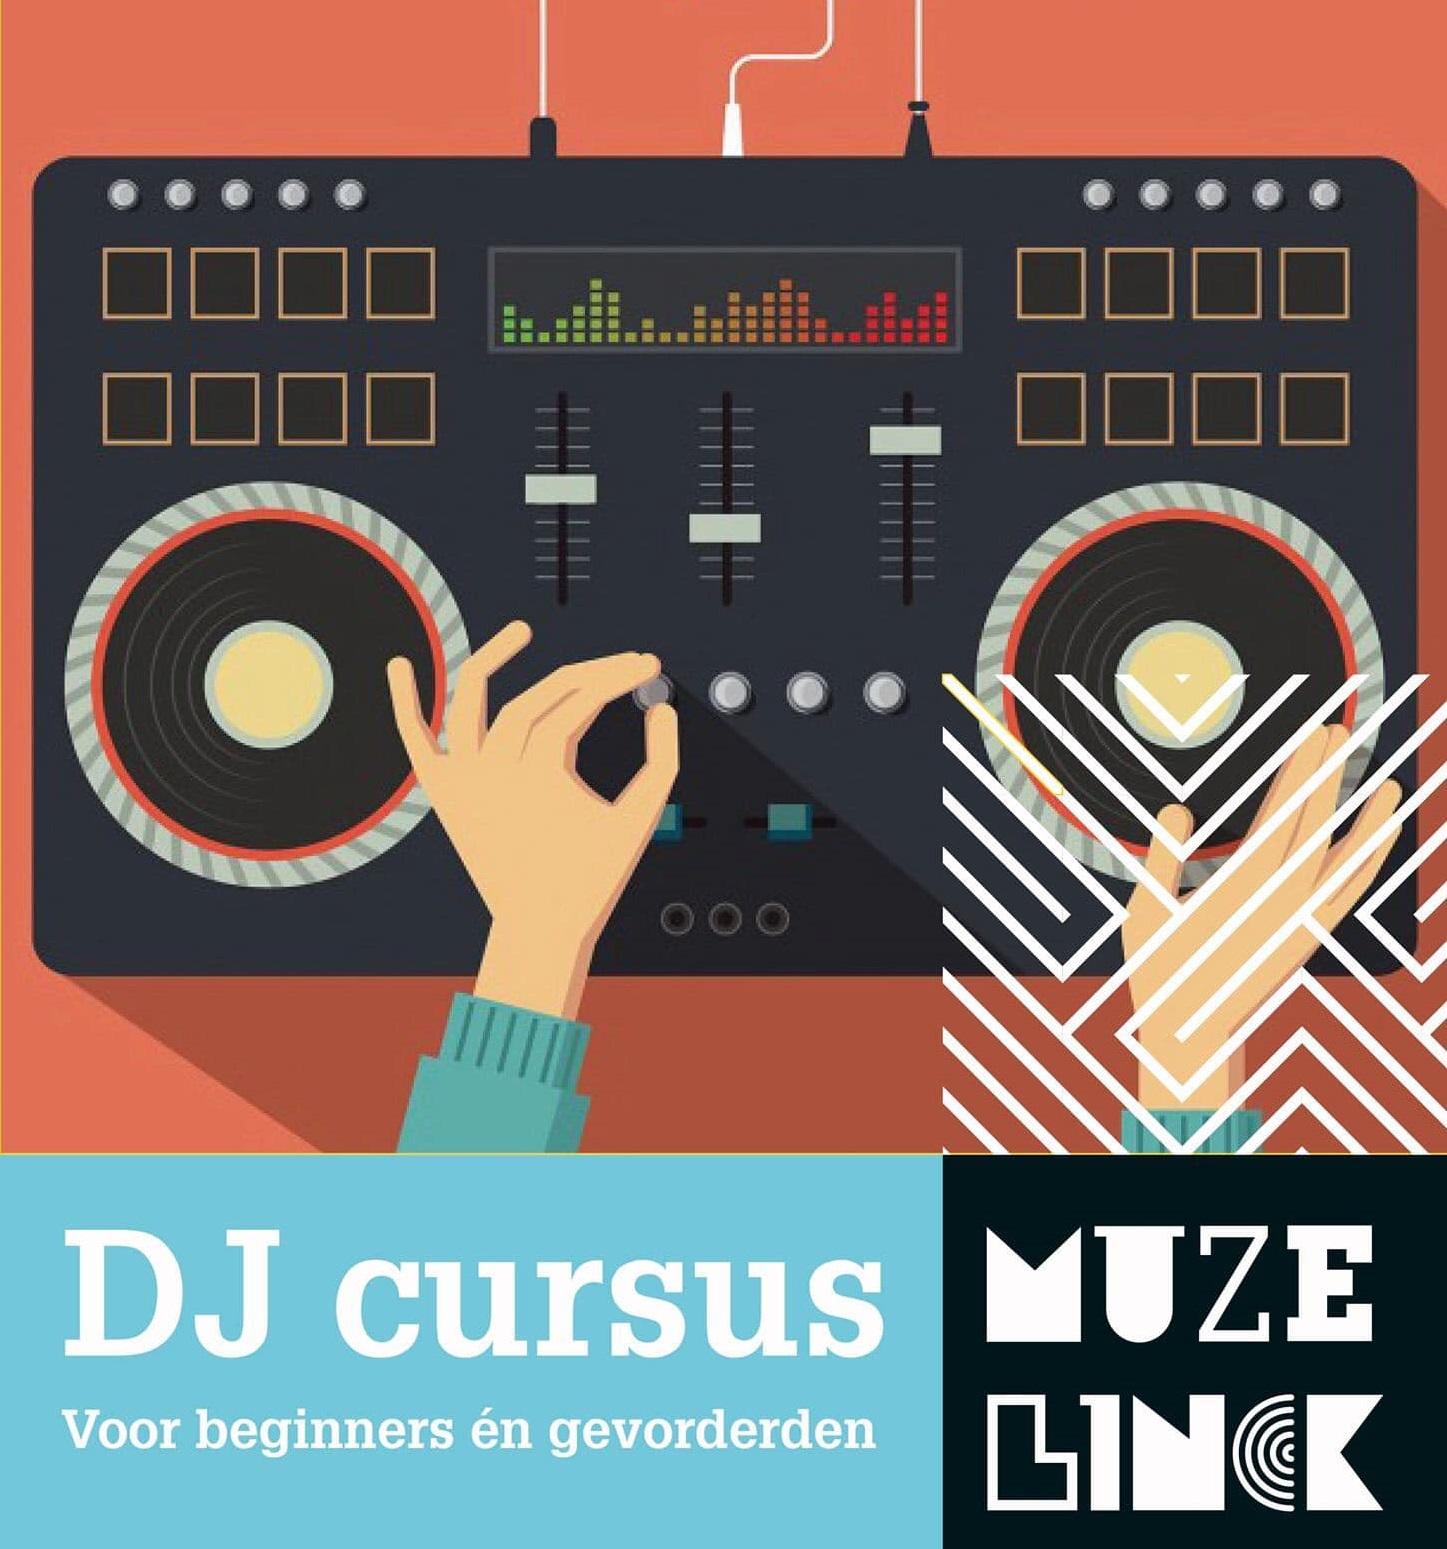 DJ Poster Muzelinck mei 2019